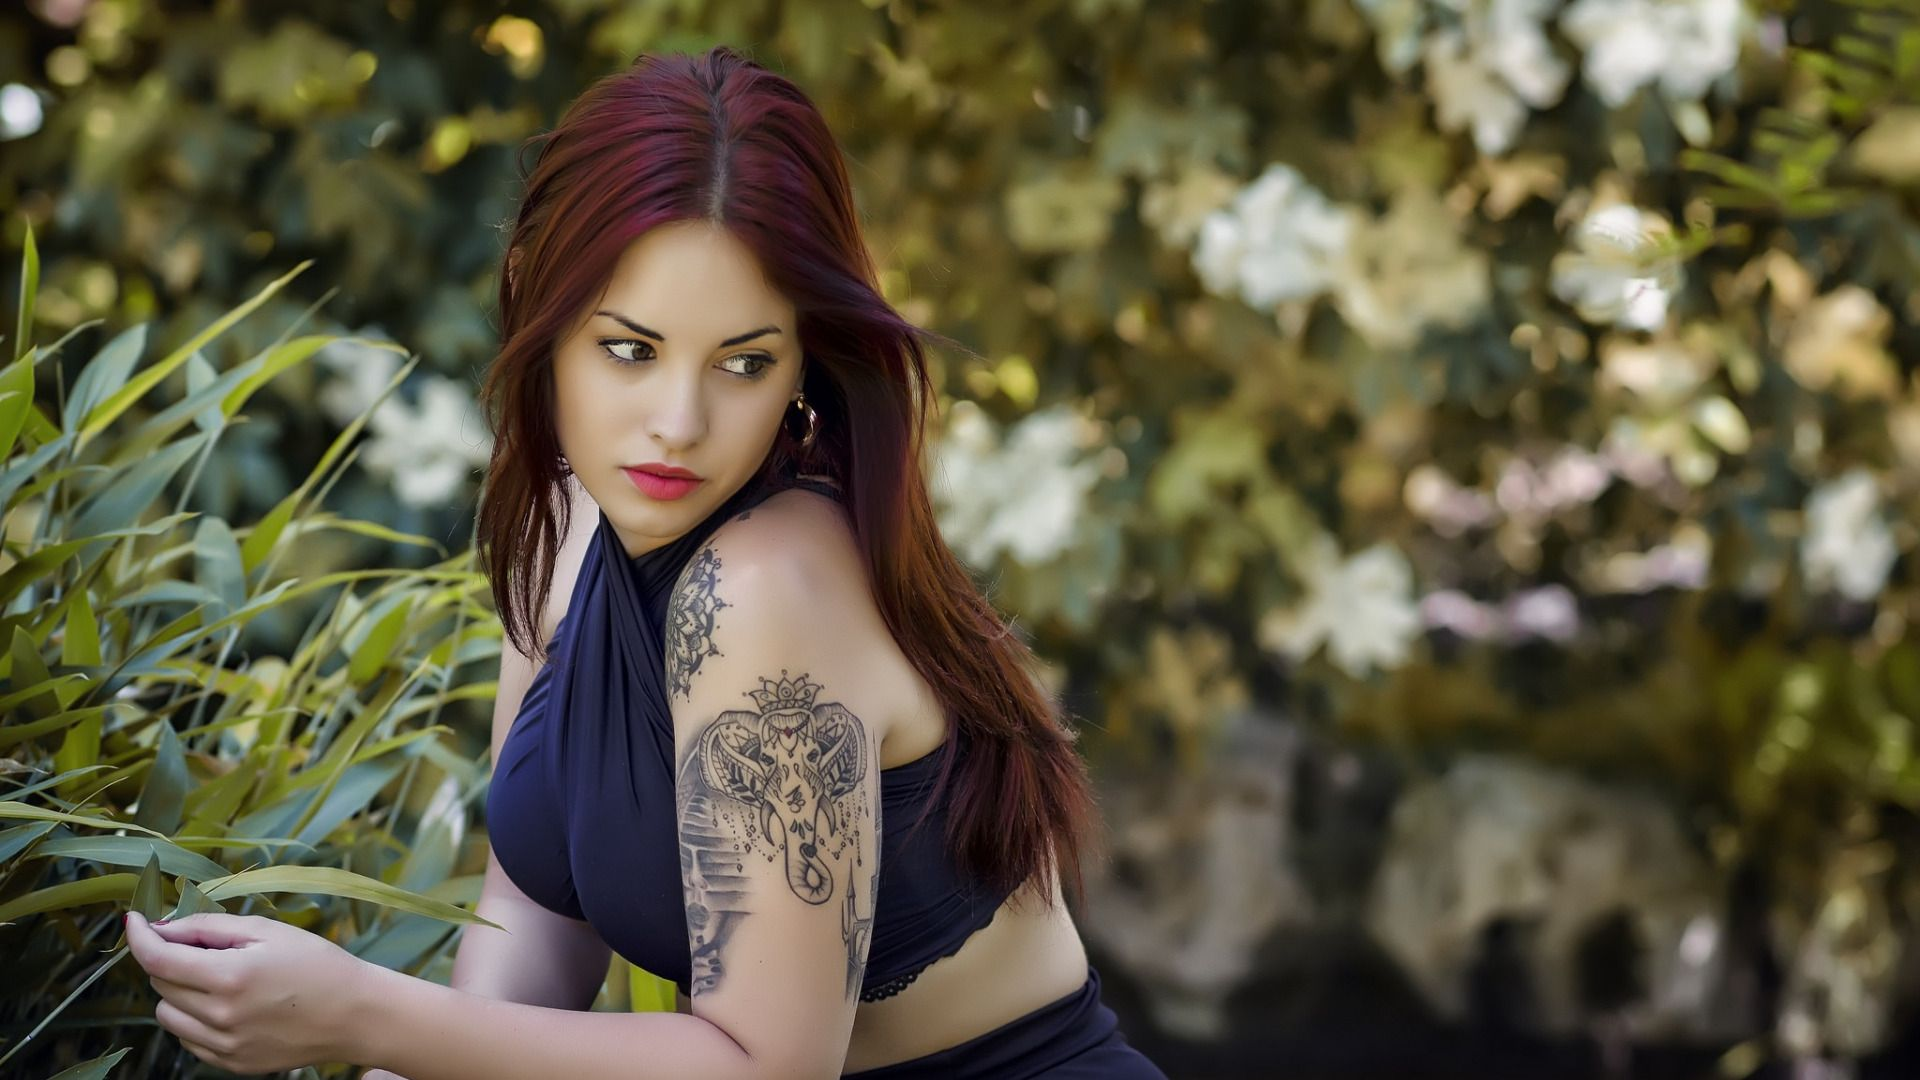 Tattoo Girl desktop wallpaper